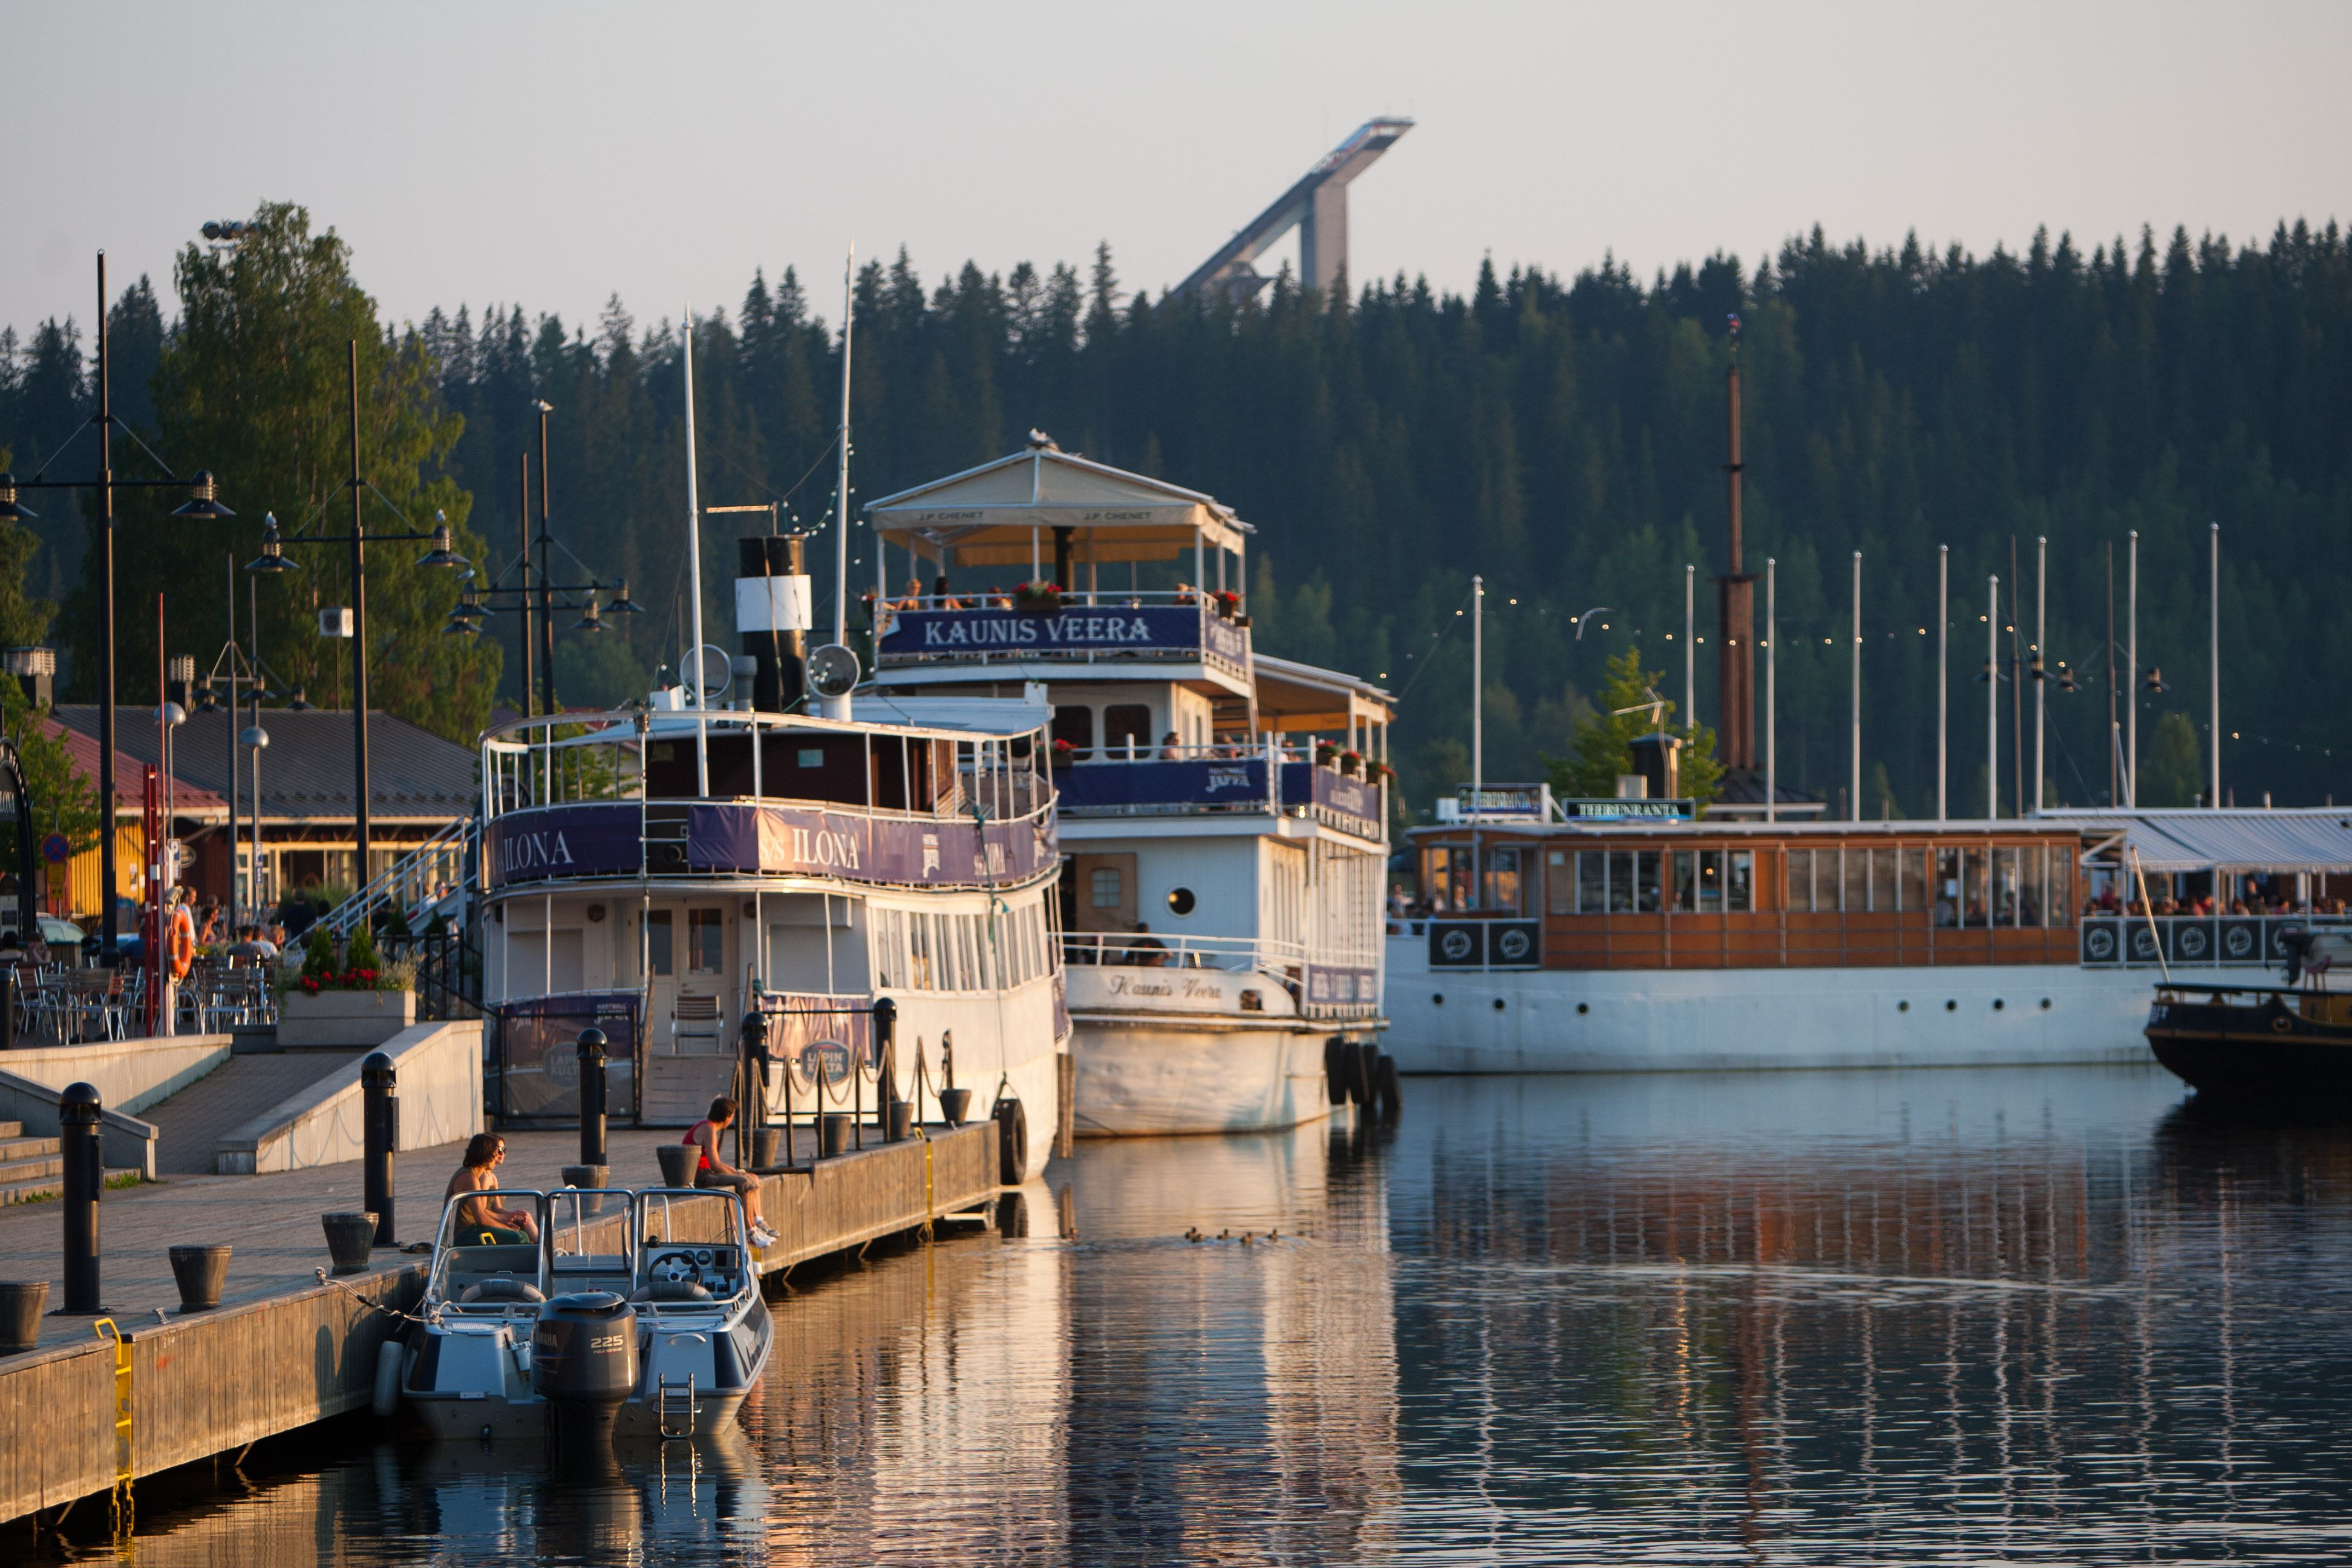 Vesijärvi Harbour | Restaurant ship S/S Ilona